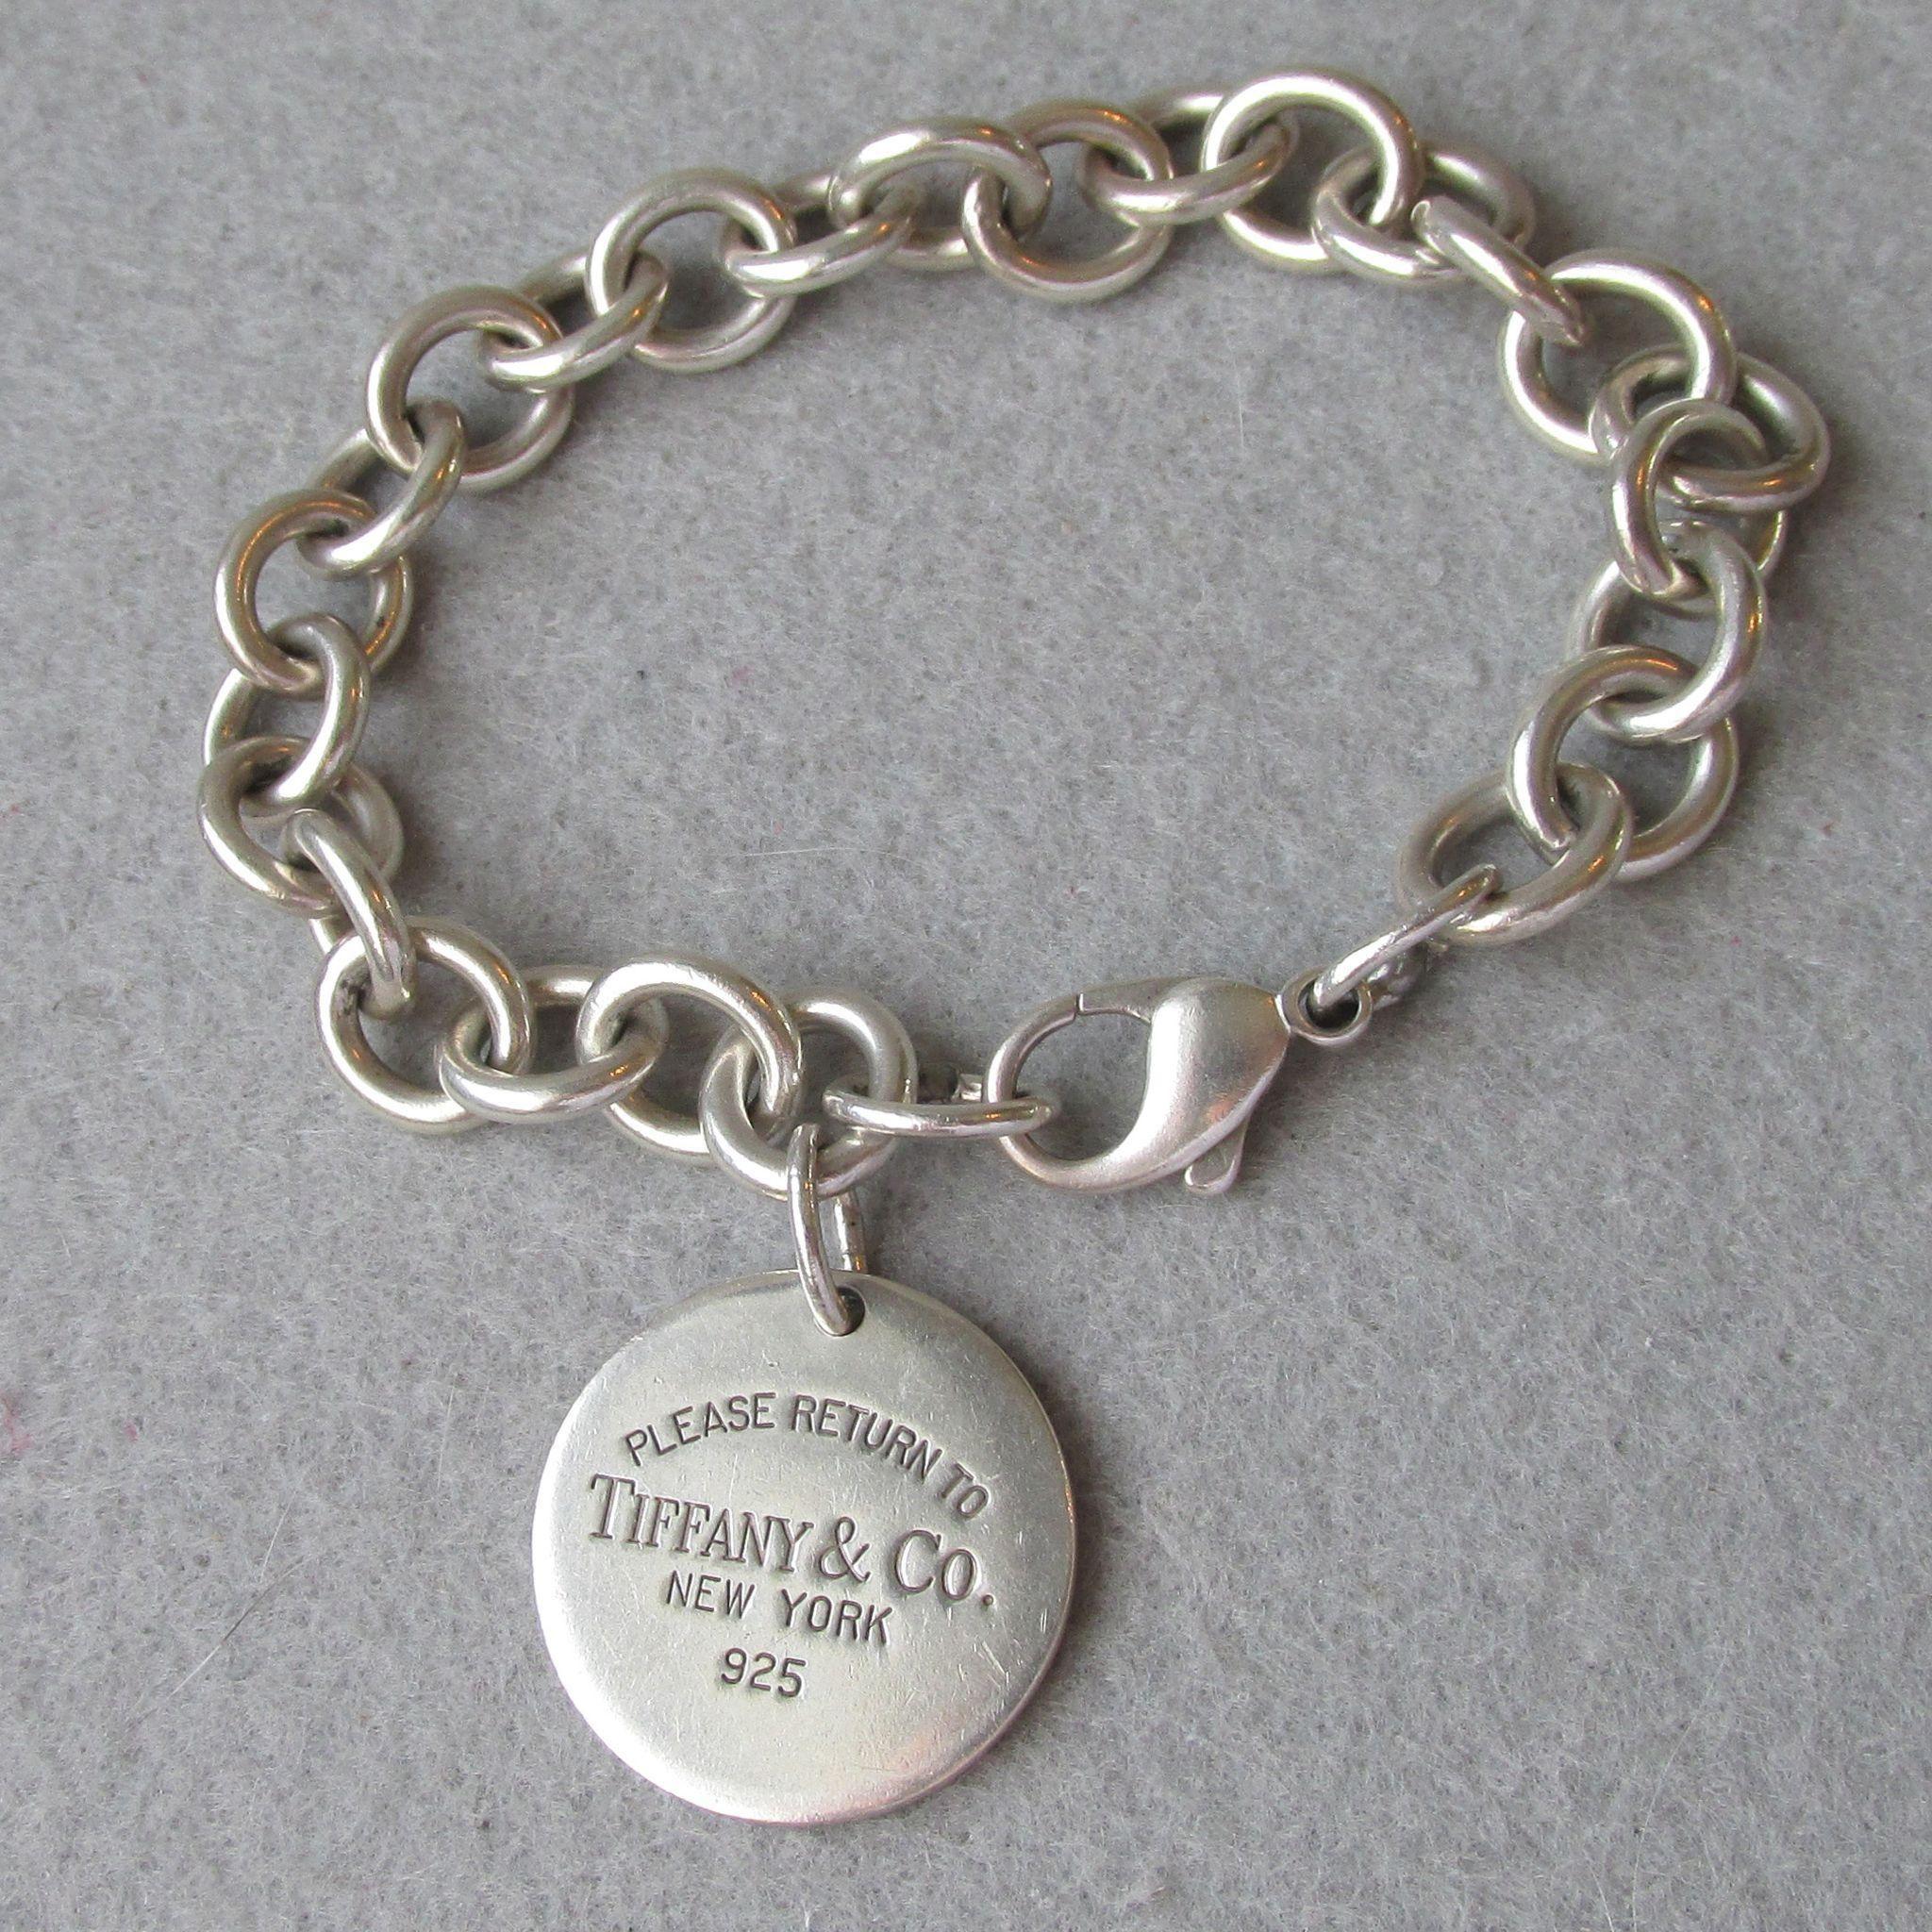 Vintage Return To Tiffany Amp Co Sterling Silver Bracelet Size Large 7 Silver Bangle Bracelets Sterling Silver Bracelets Tiffany Bracelets